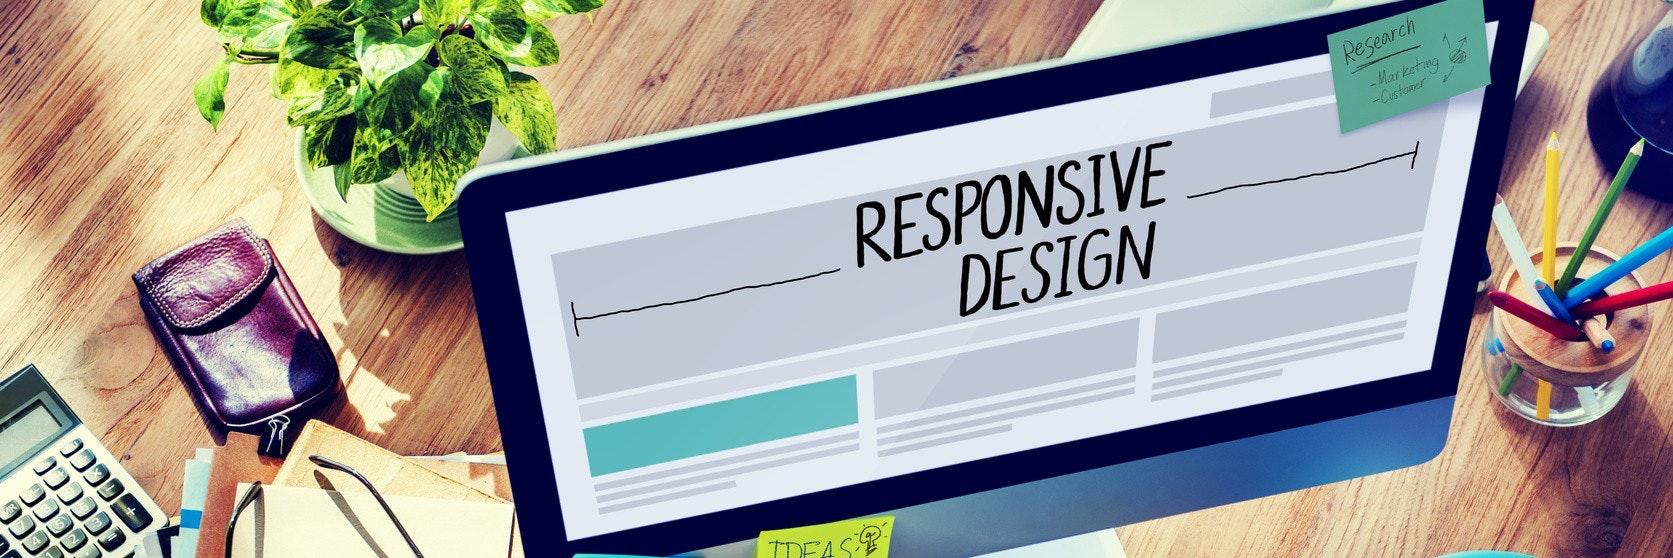 IT SCHNITTSTELLE  - ®The Webdesign Company